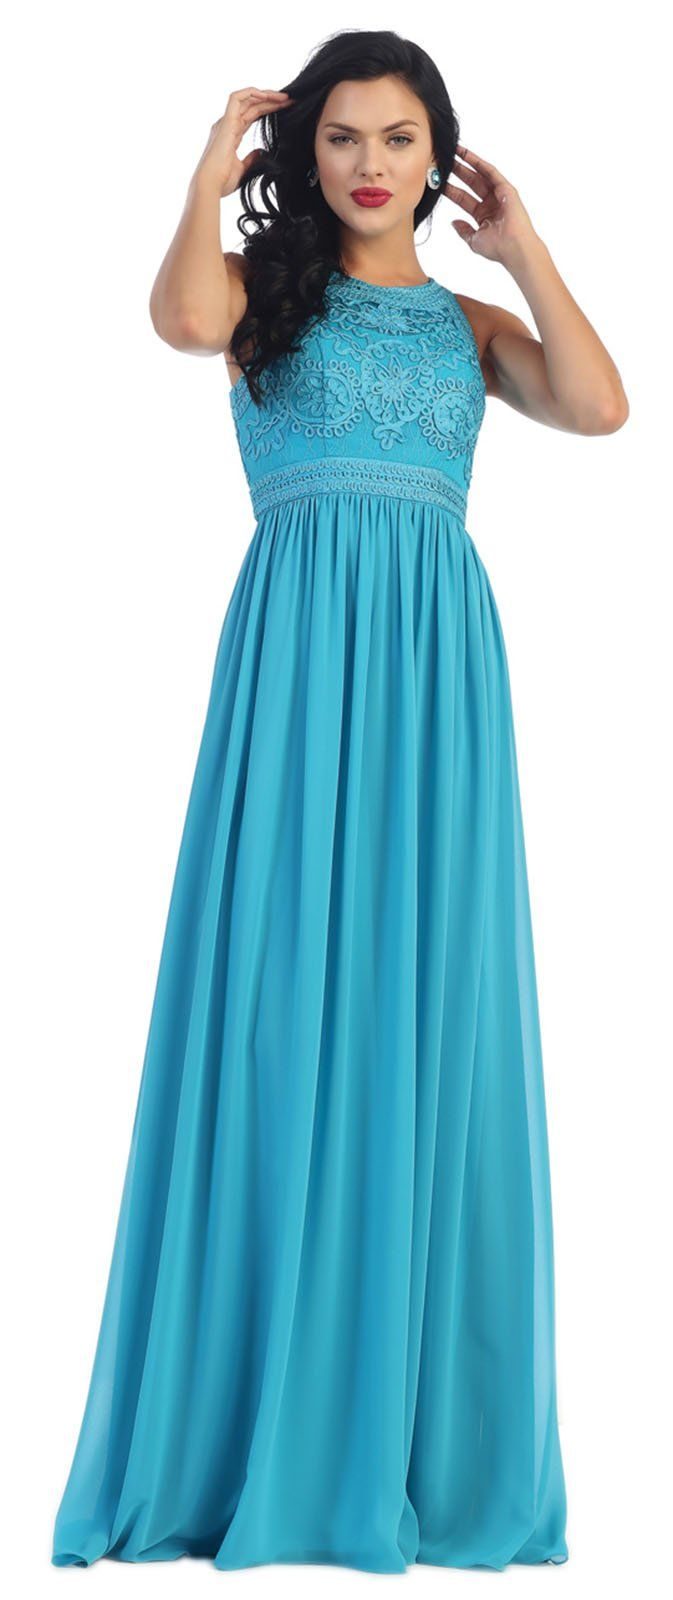 May Queen MQ1289 Empire Waist Prom Dress (4, Fuchsia). Spot Clean ...